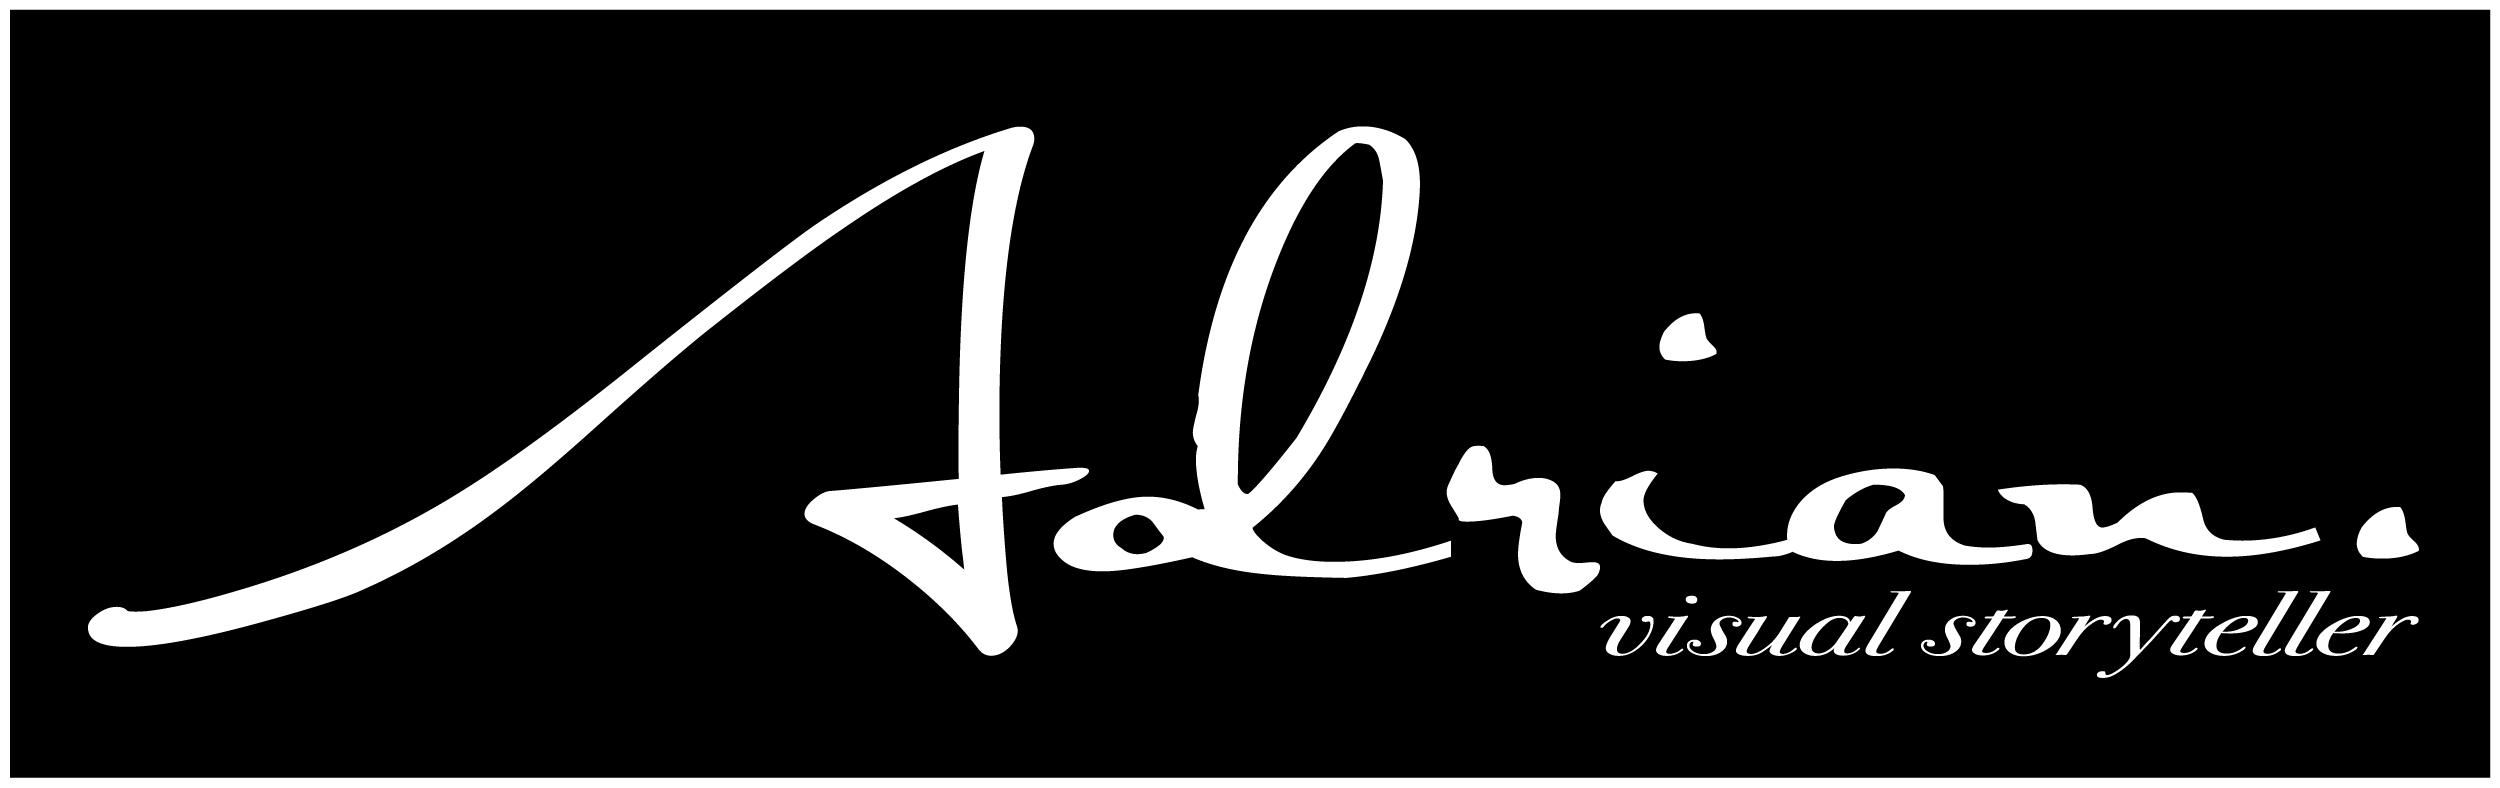 London Fashion Photographer Logo